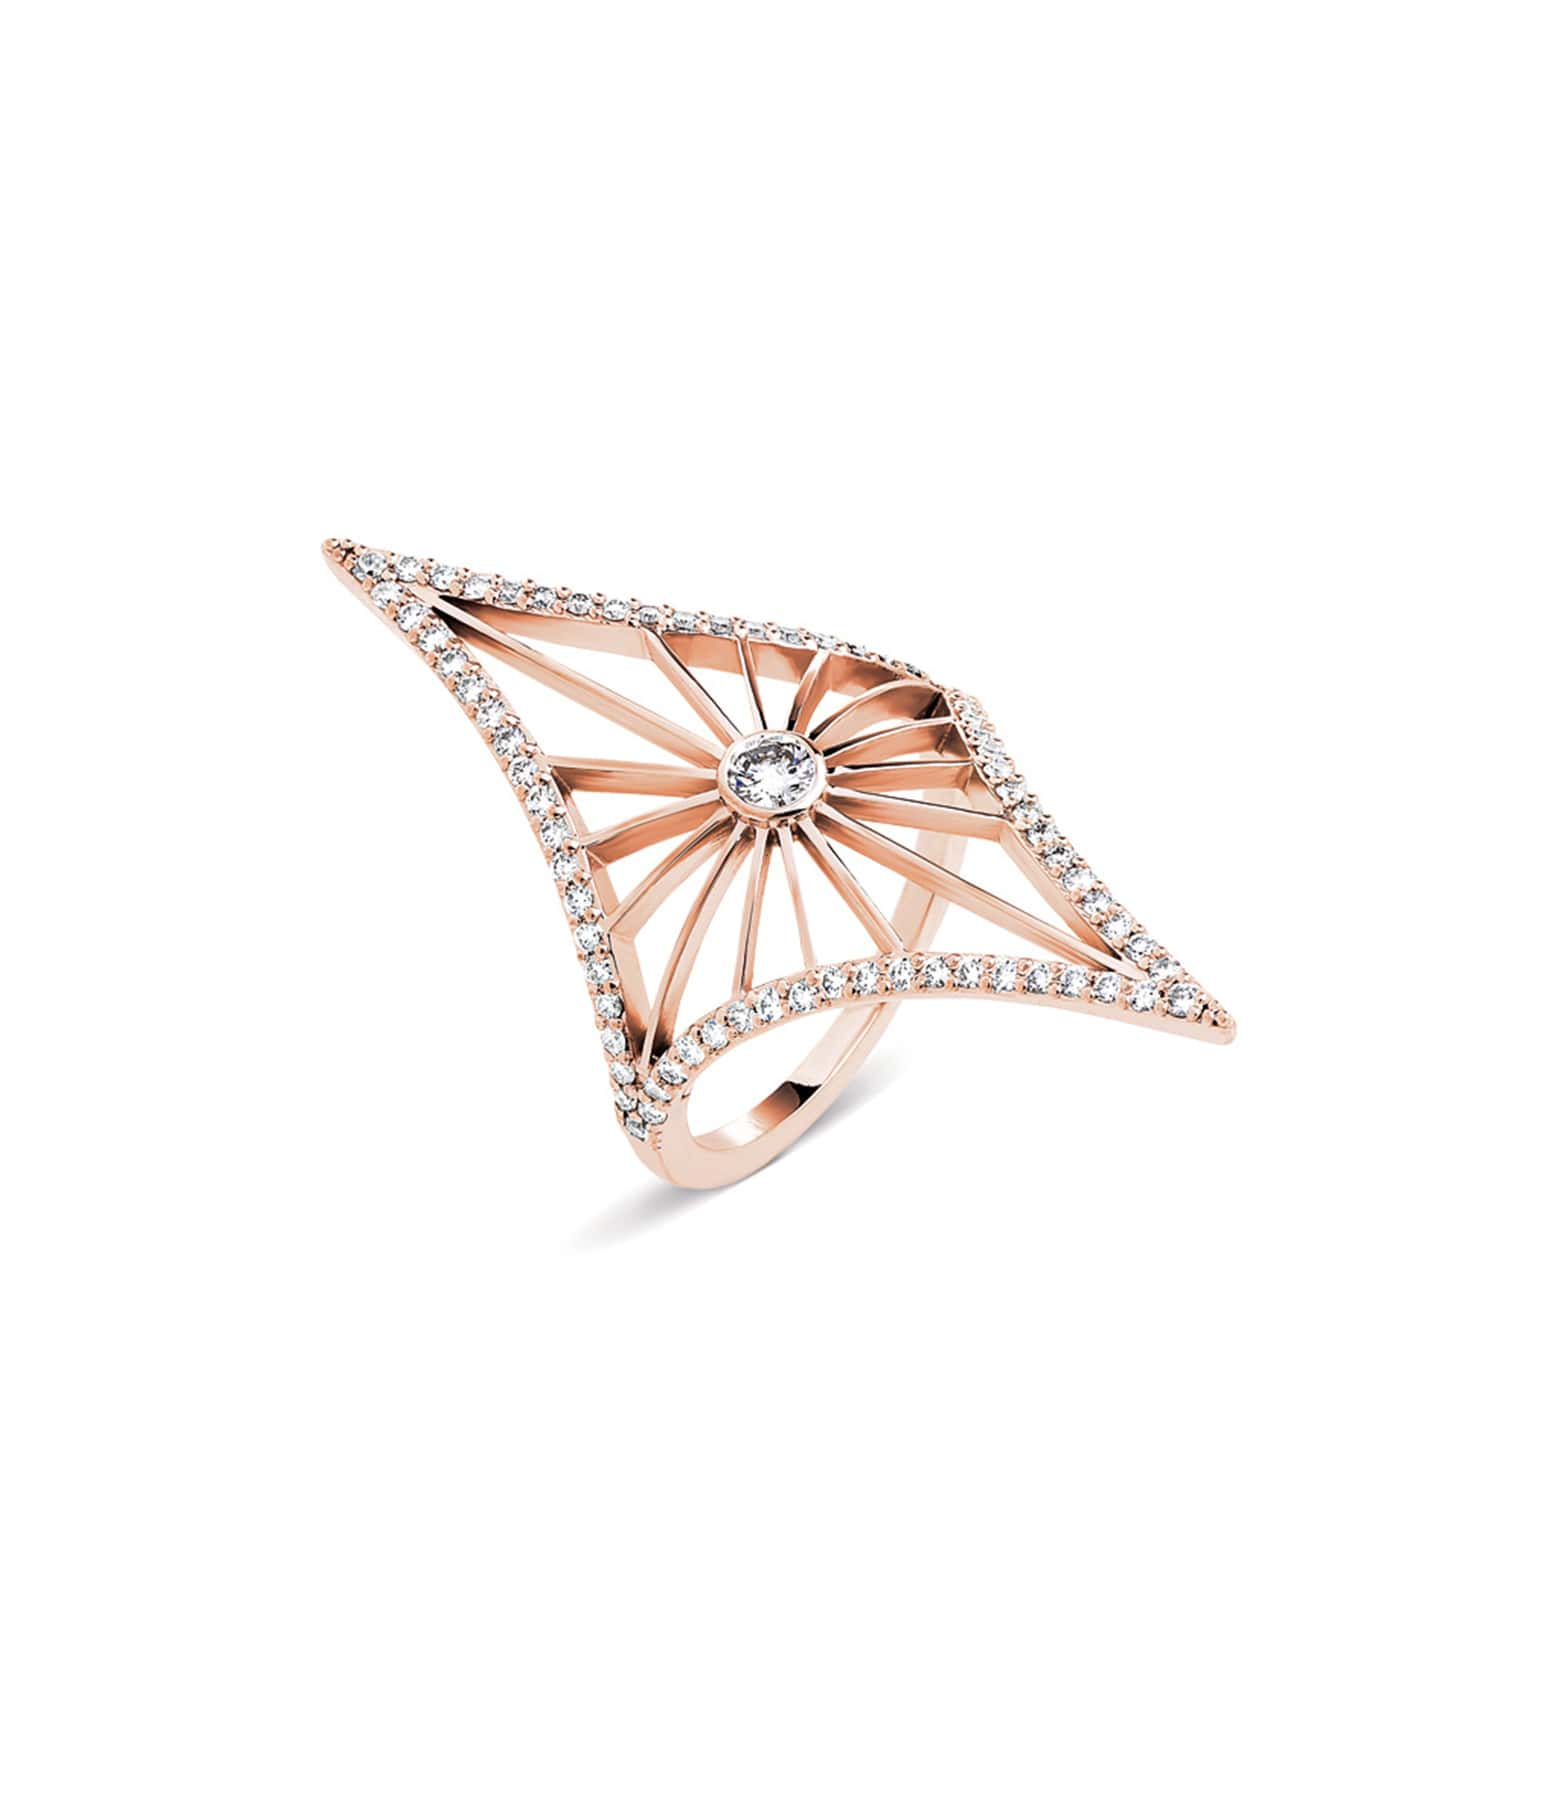 NAVA JOAILLERIE - Bague Cheyenne Losange Diamants Or Rose